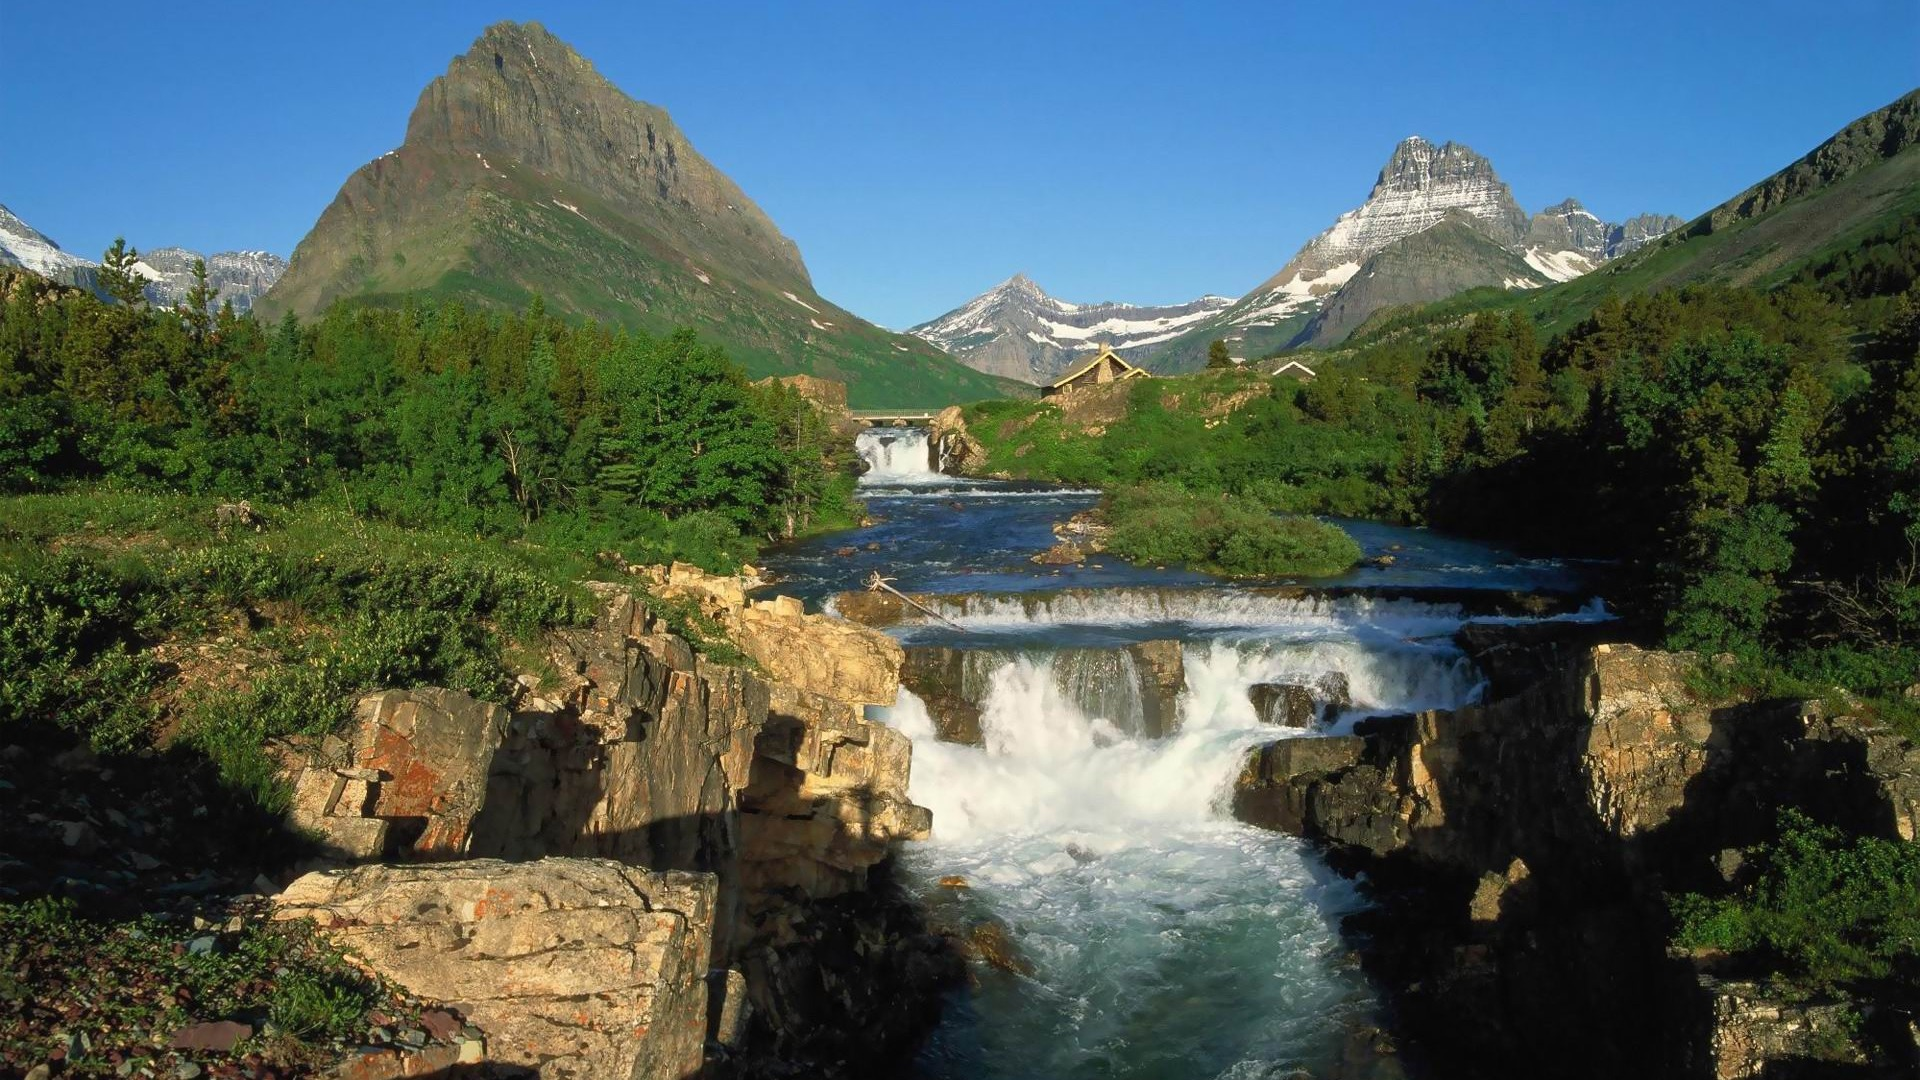 Glacier National Park Landscape Wallpaper Full HD Desktop Wallpaper 1920x1080